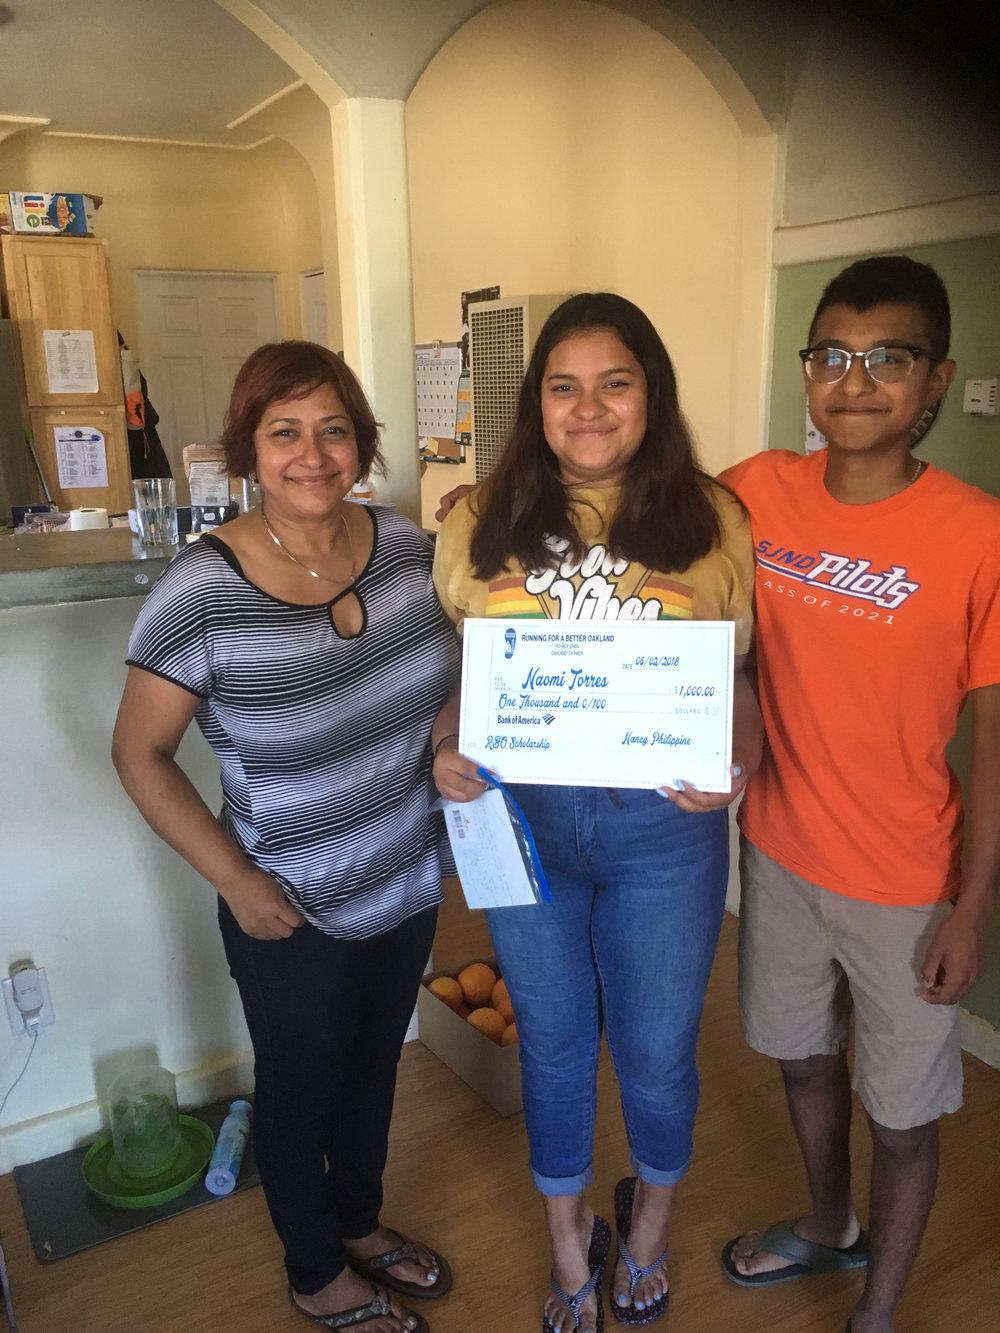 NaomiwithMomandChris-0601-scholarships.jpg